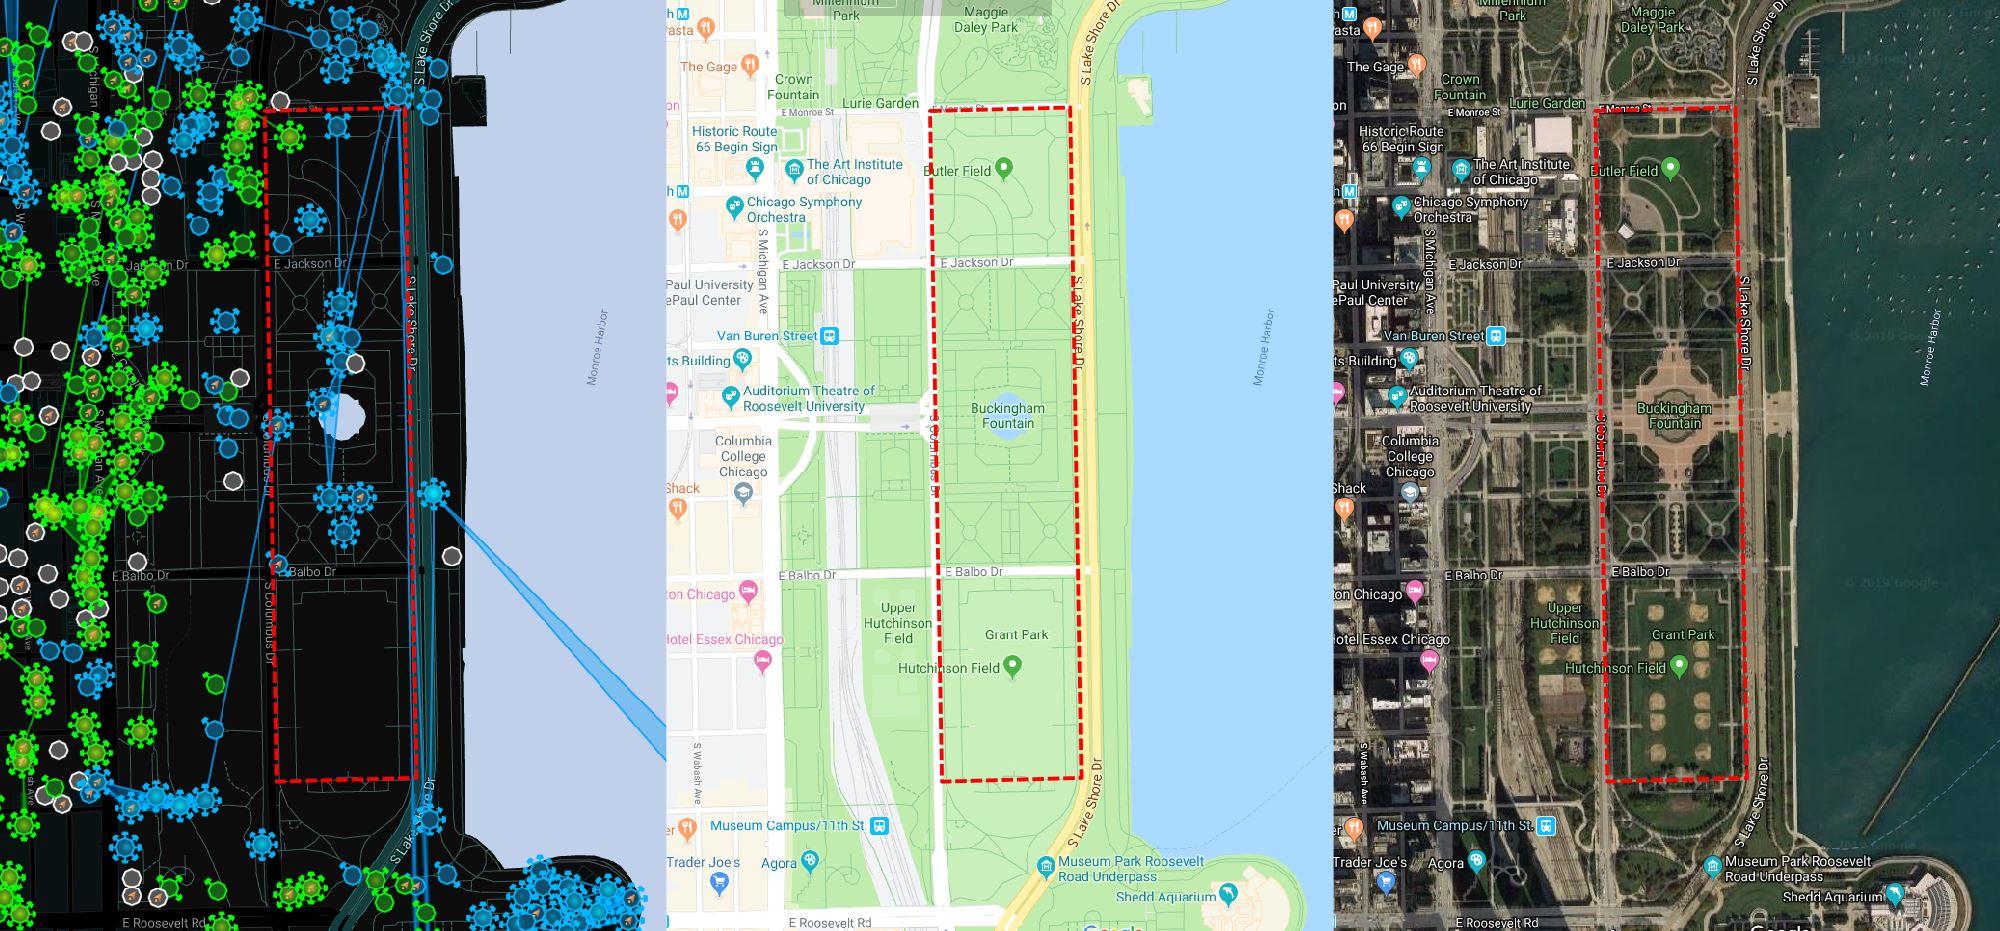 Nom : map.jpg Affichages : 144 Taille : 385,0 Ko